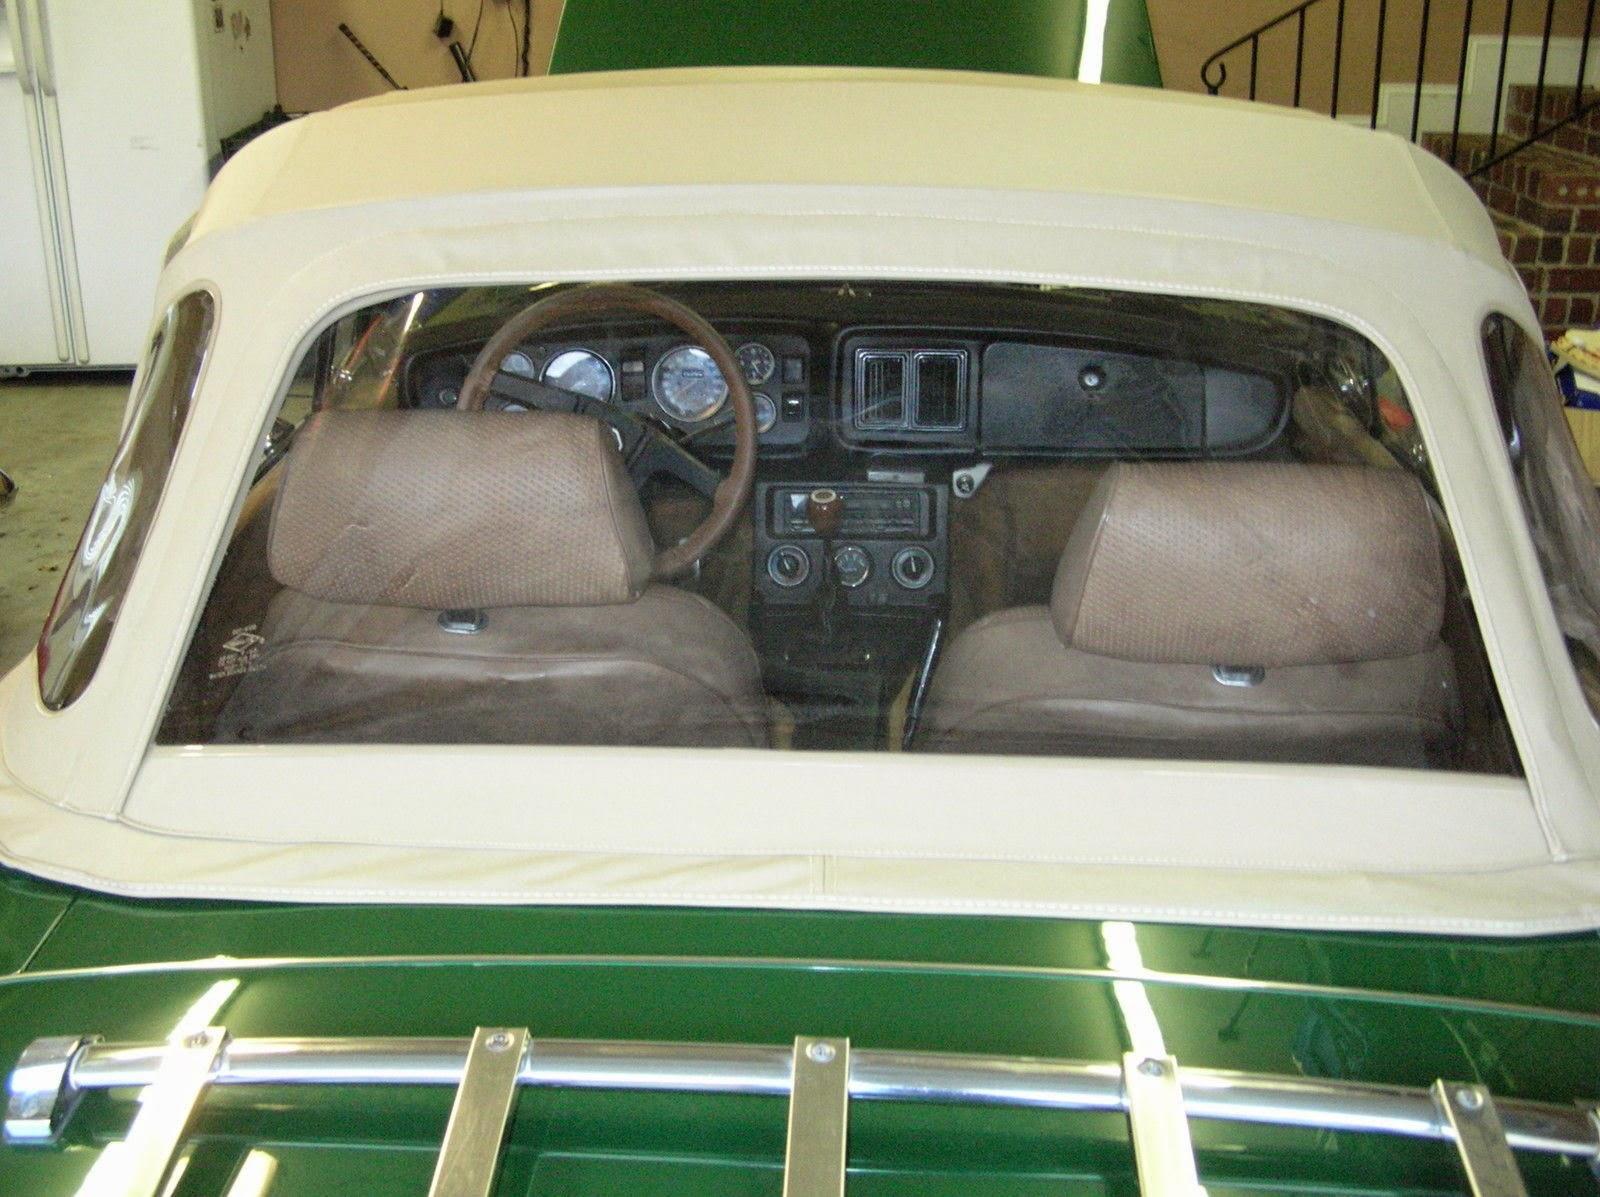 Daily Turismo: 10k: Super Swap Saturday: 1977 MG MGB Rover V8